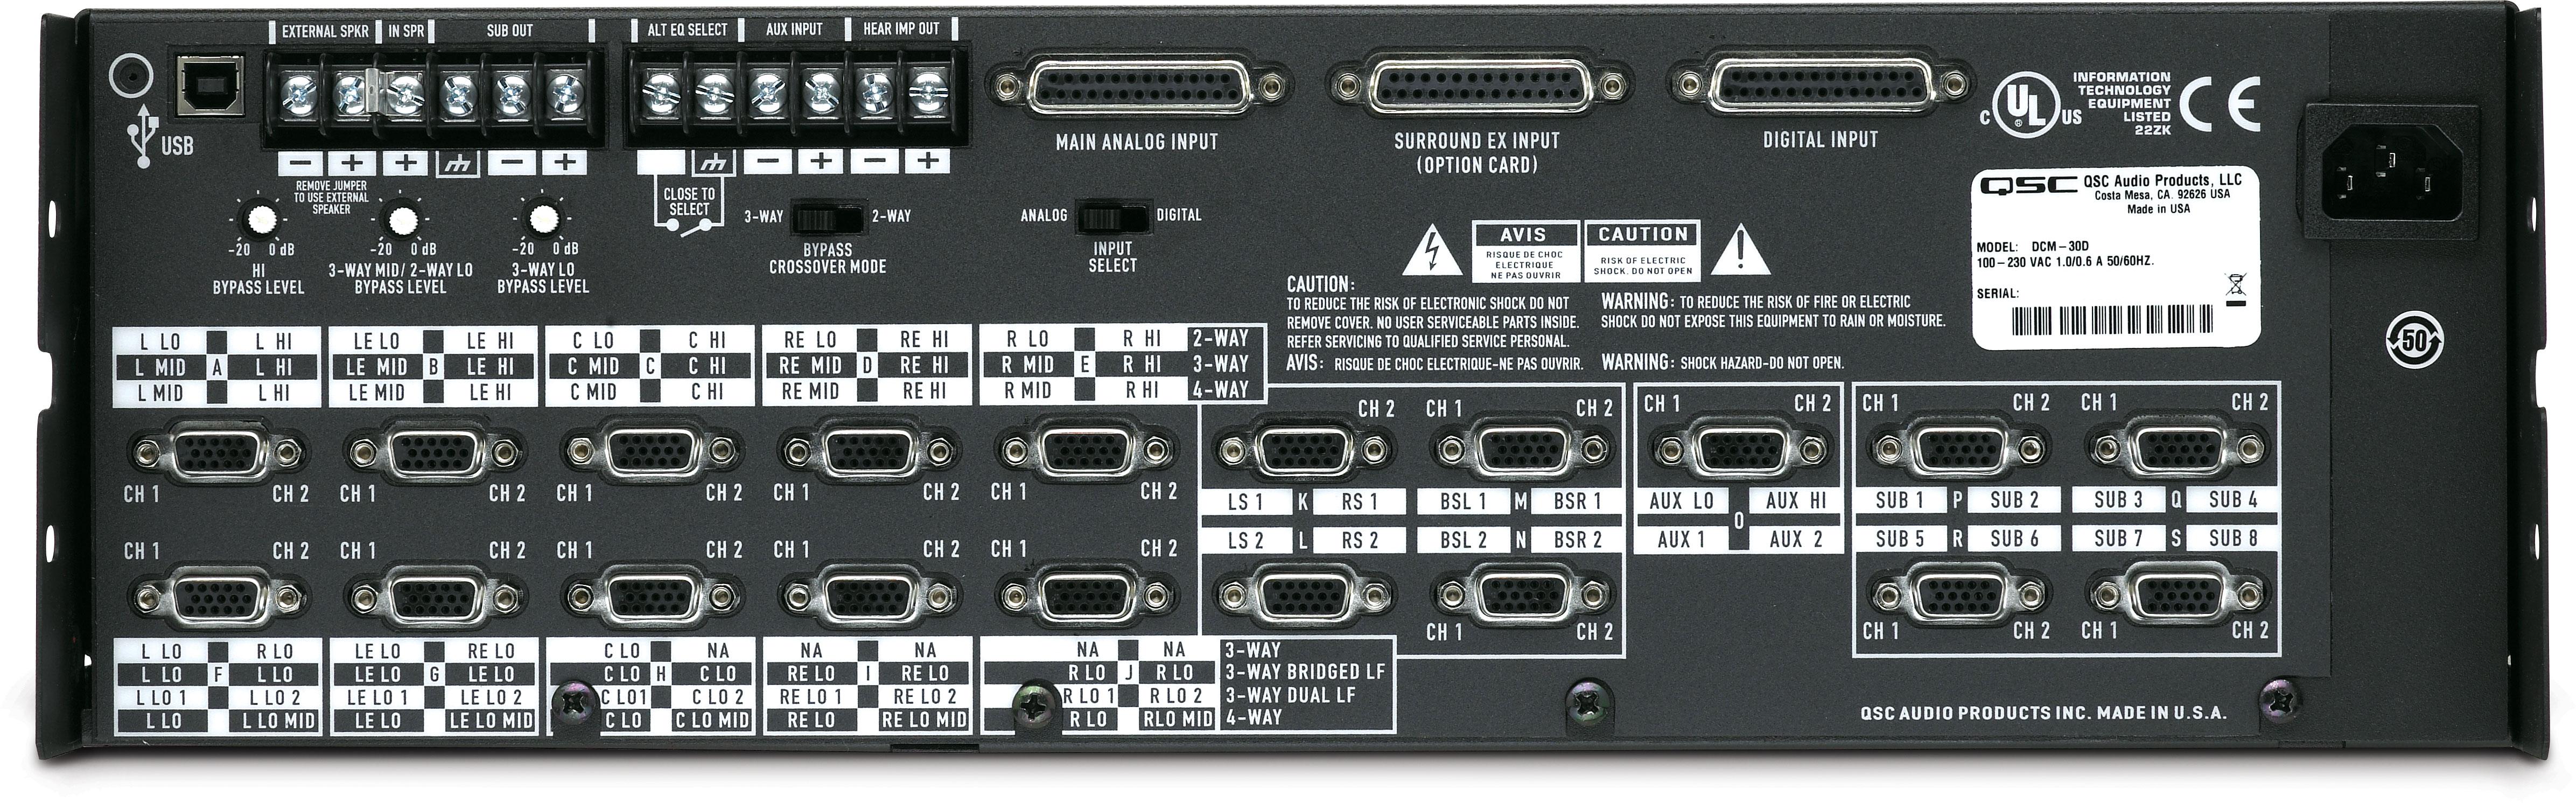 DCM 30D Digital Cinema Monitor ndash QSC